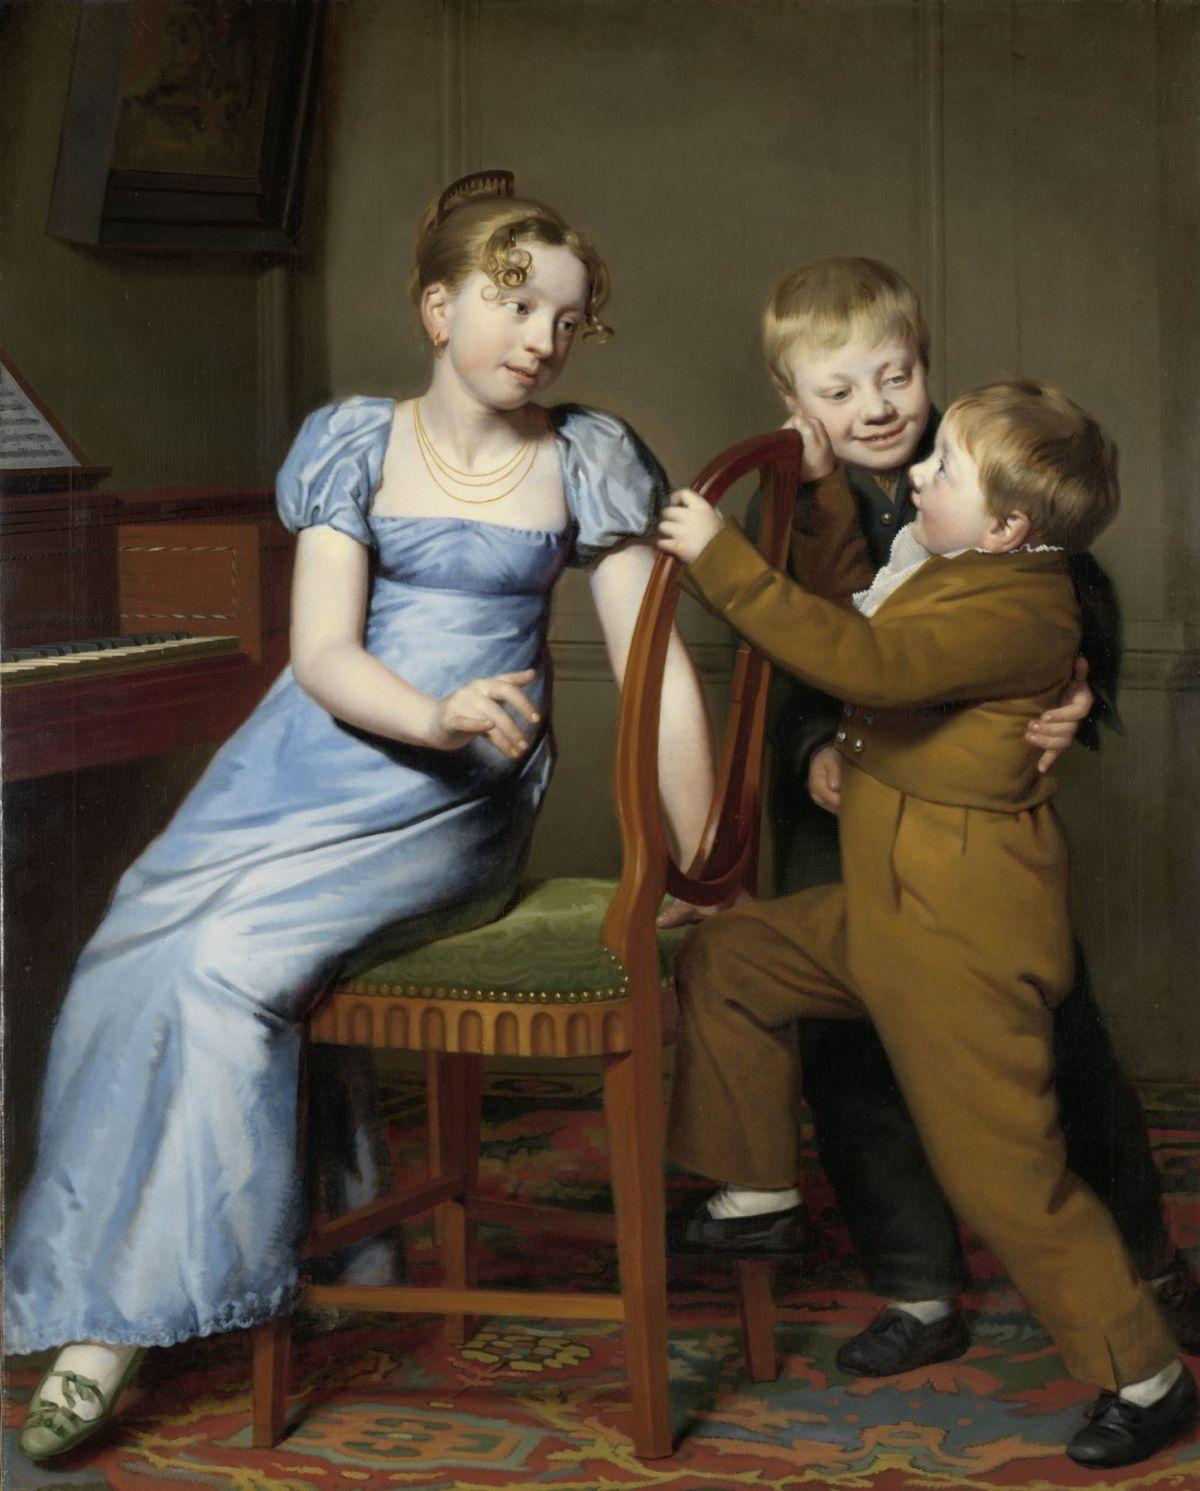 Piano Practice Interrupted by Willem Bartel van der Kooi